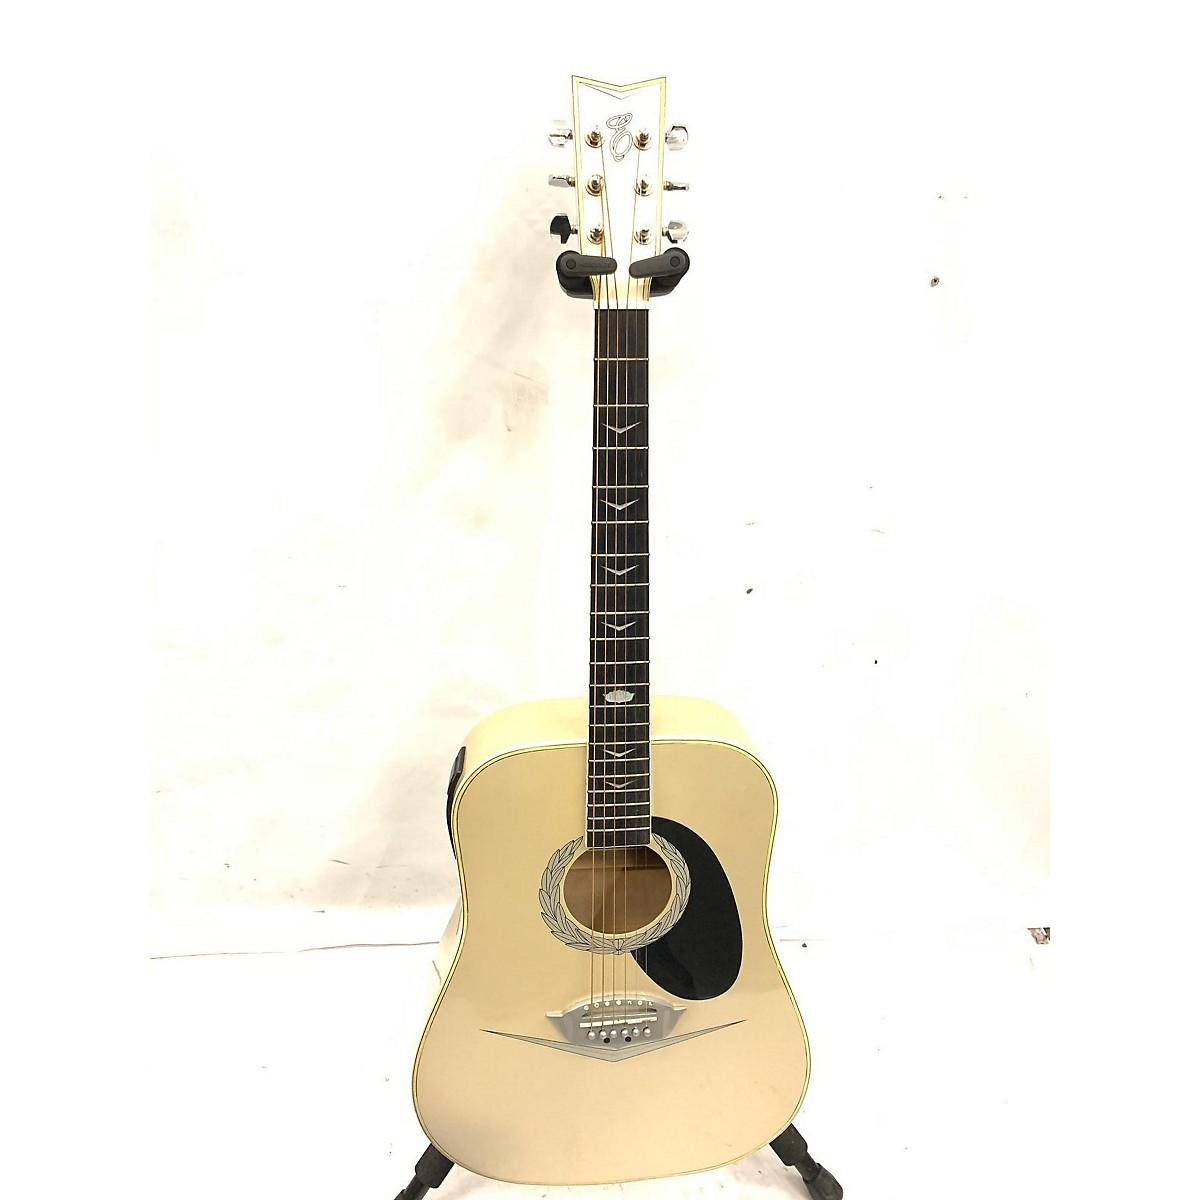 Esteban Cadillac Acoustic Electric Guitar